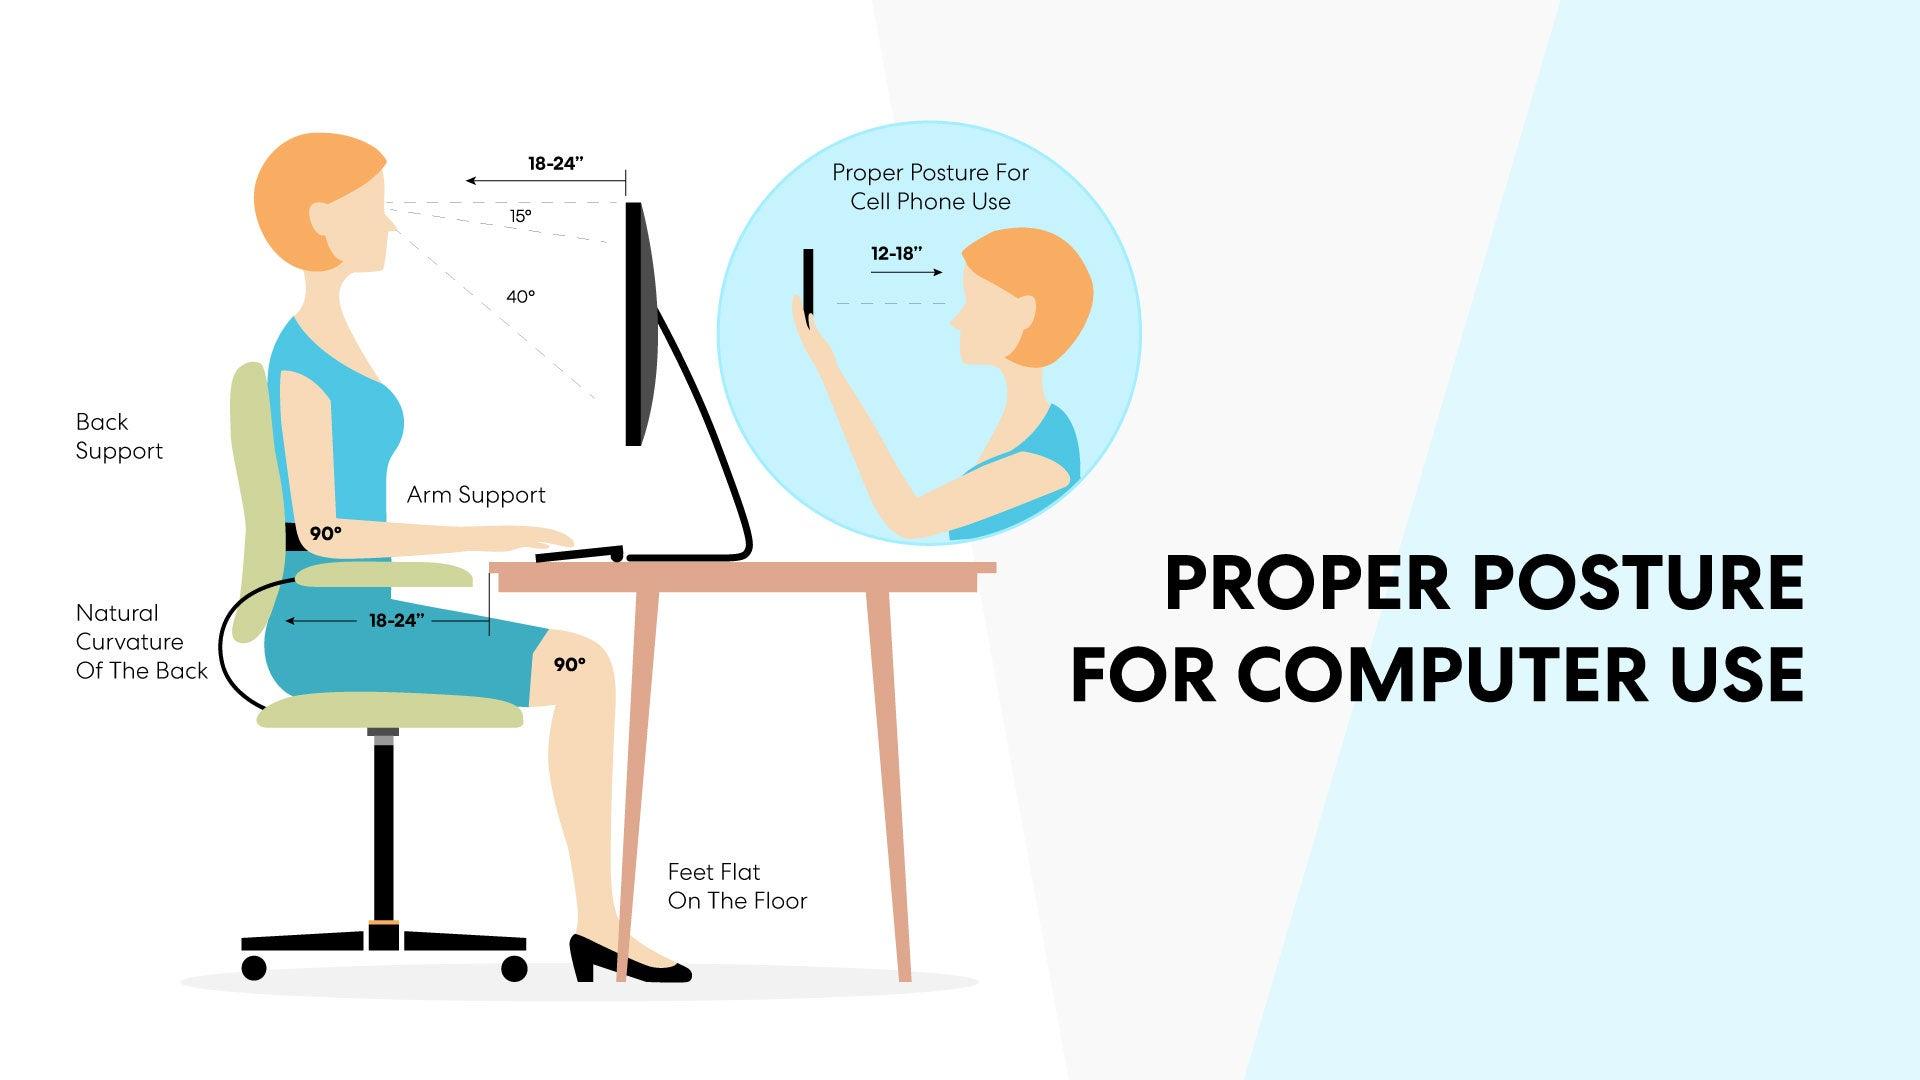 Proper Posture for Computer Use